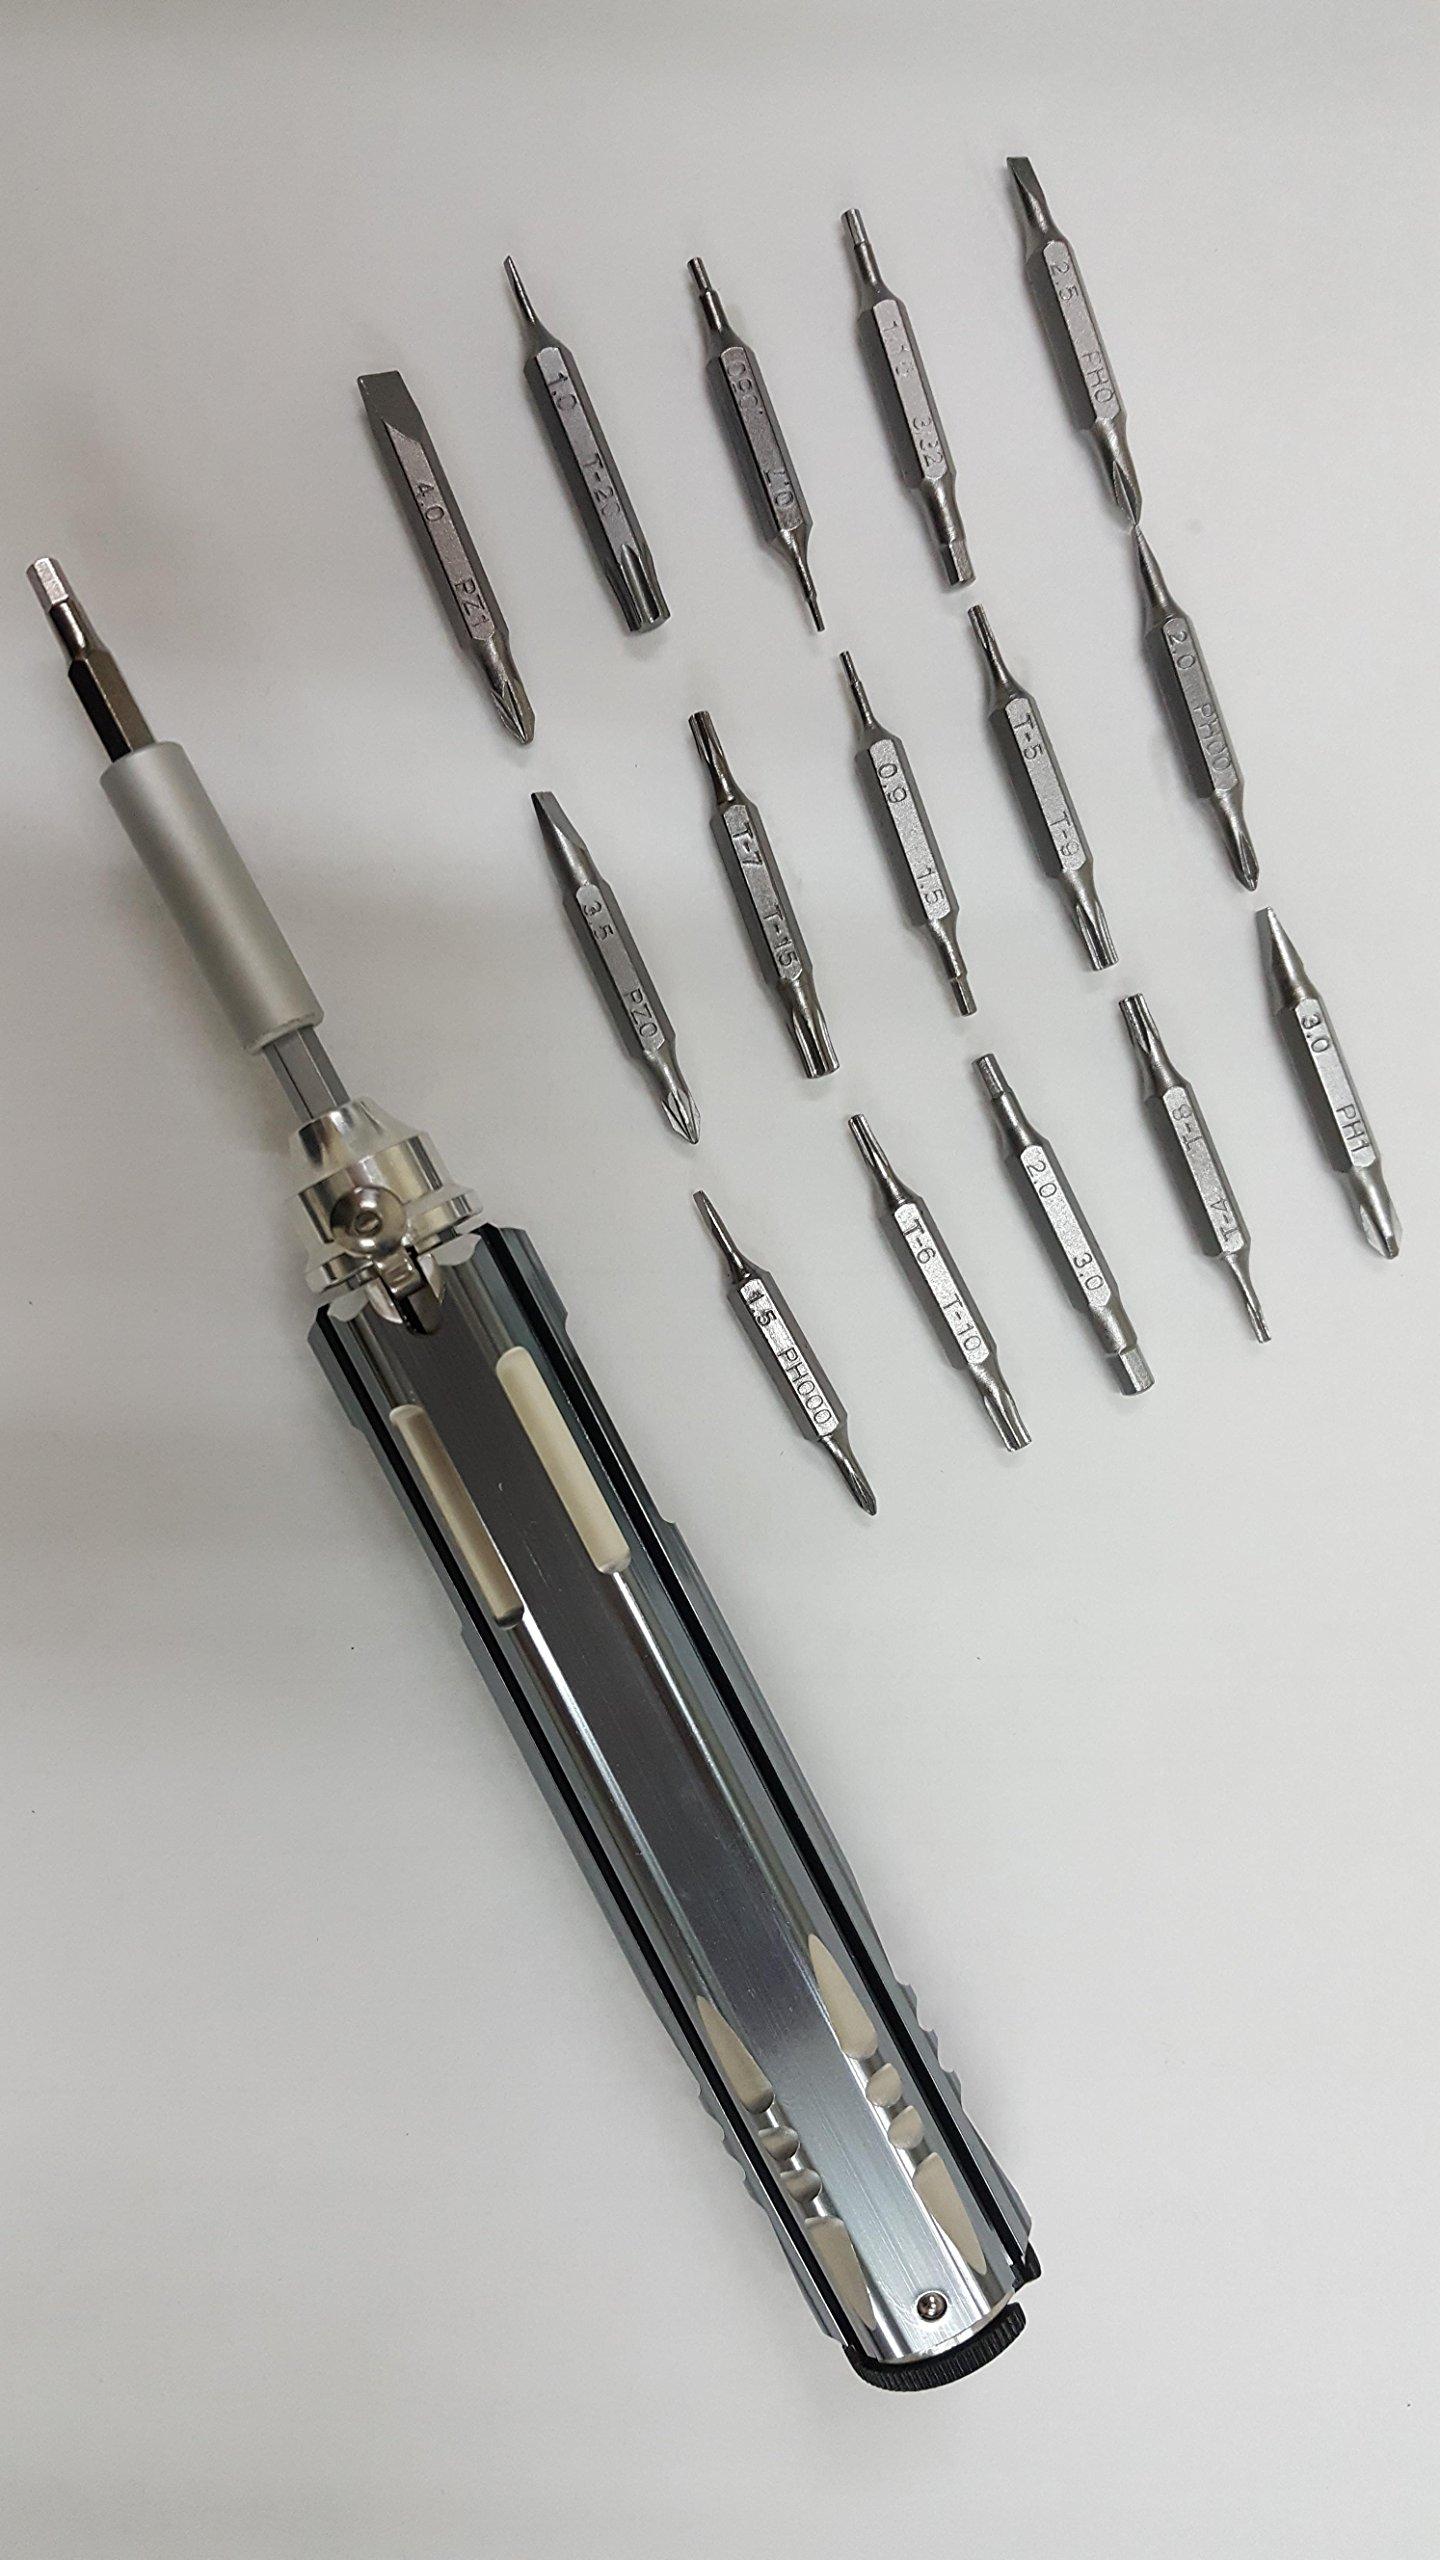 Adjustable 32 in 1 Multi Tool - Hex/Flat/Phillips/Hexalobular